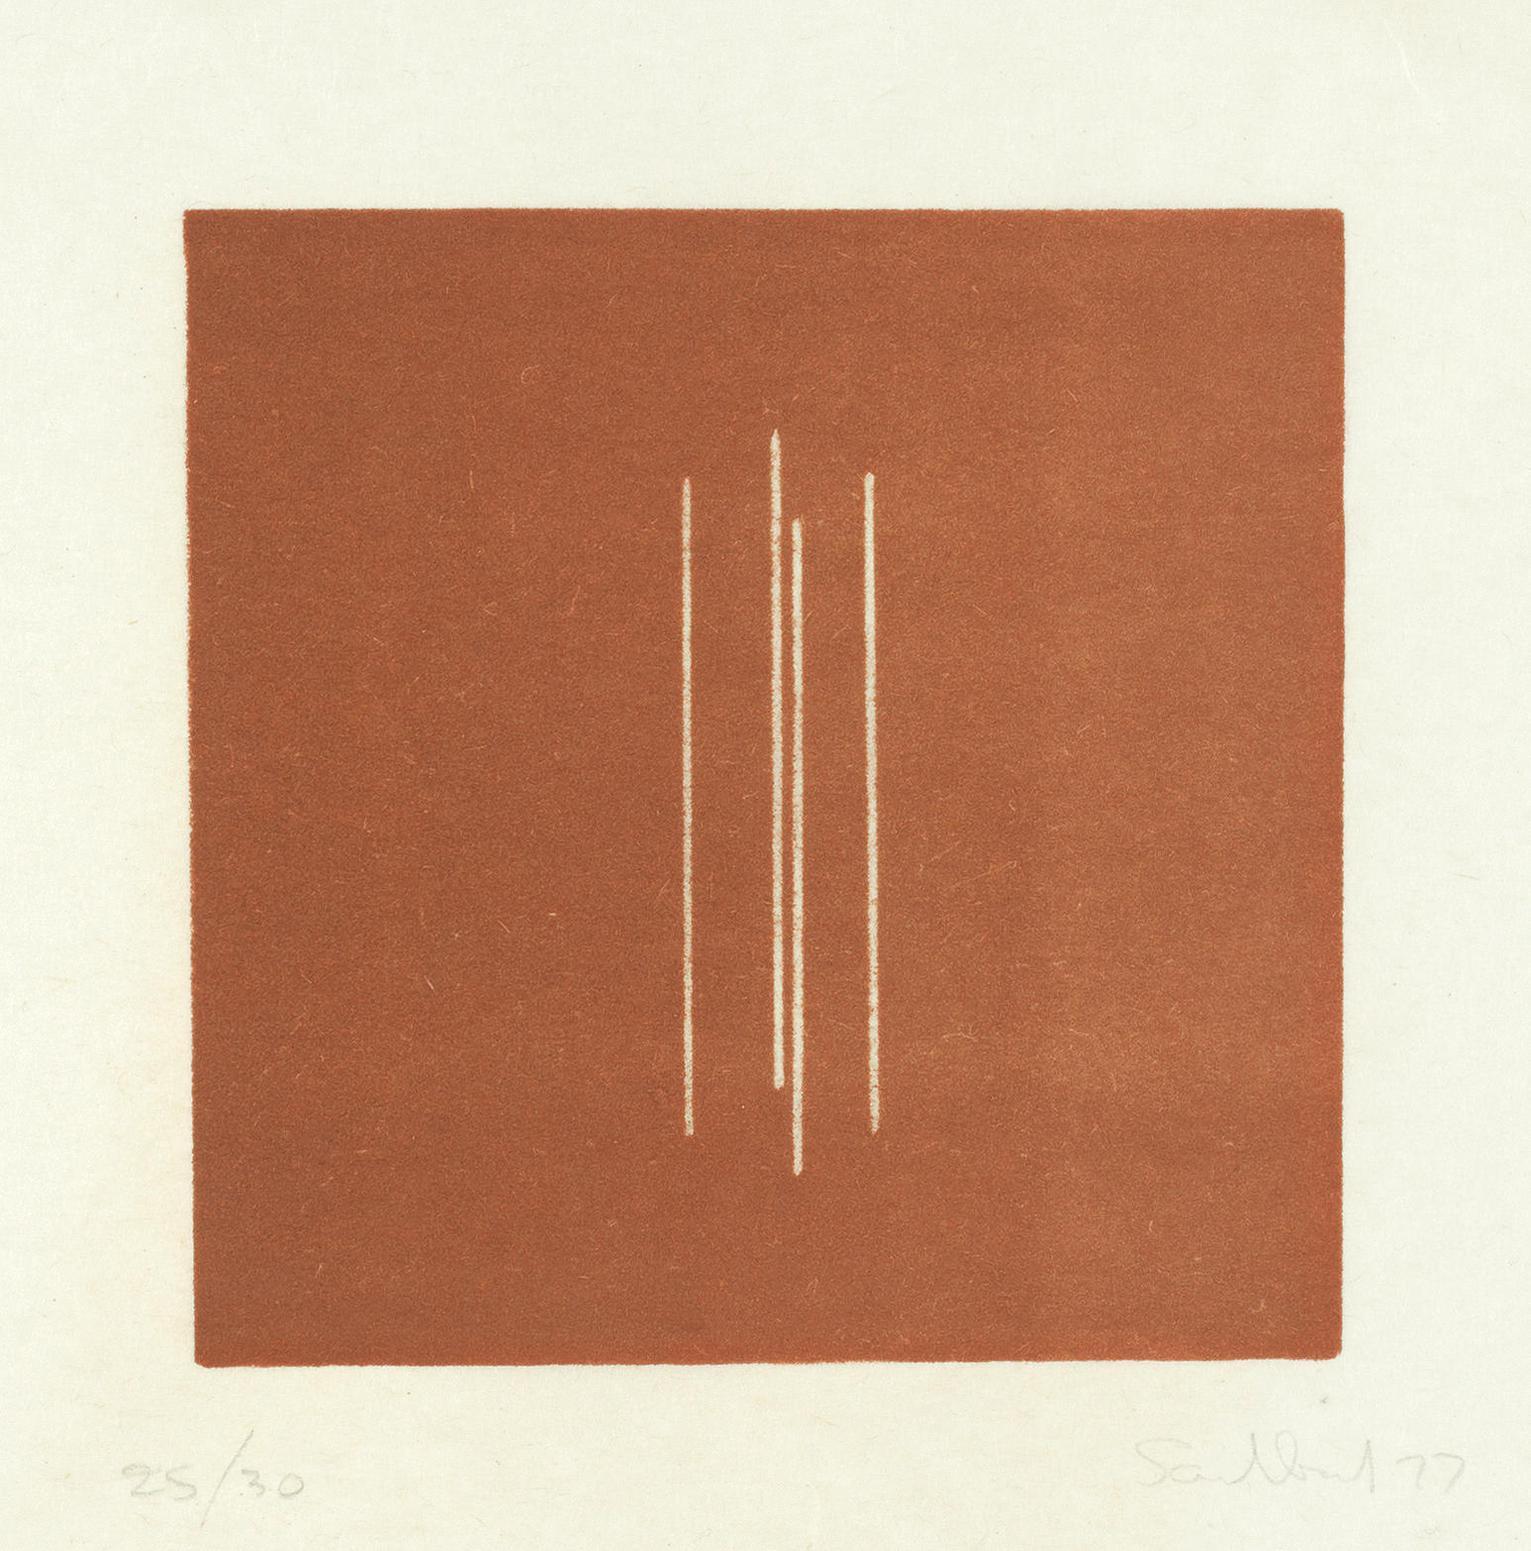 Fred Sandback-Untitled, From Mappe Mit 10 Umkehrlithographien-1977